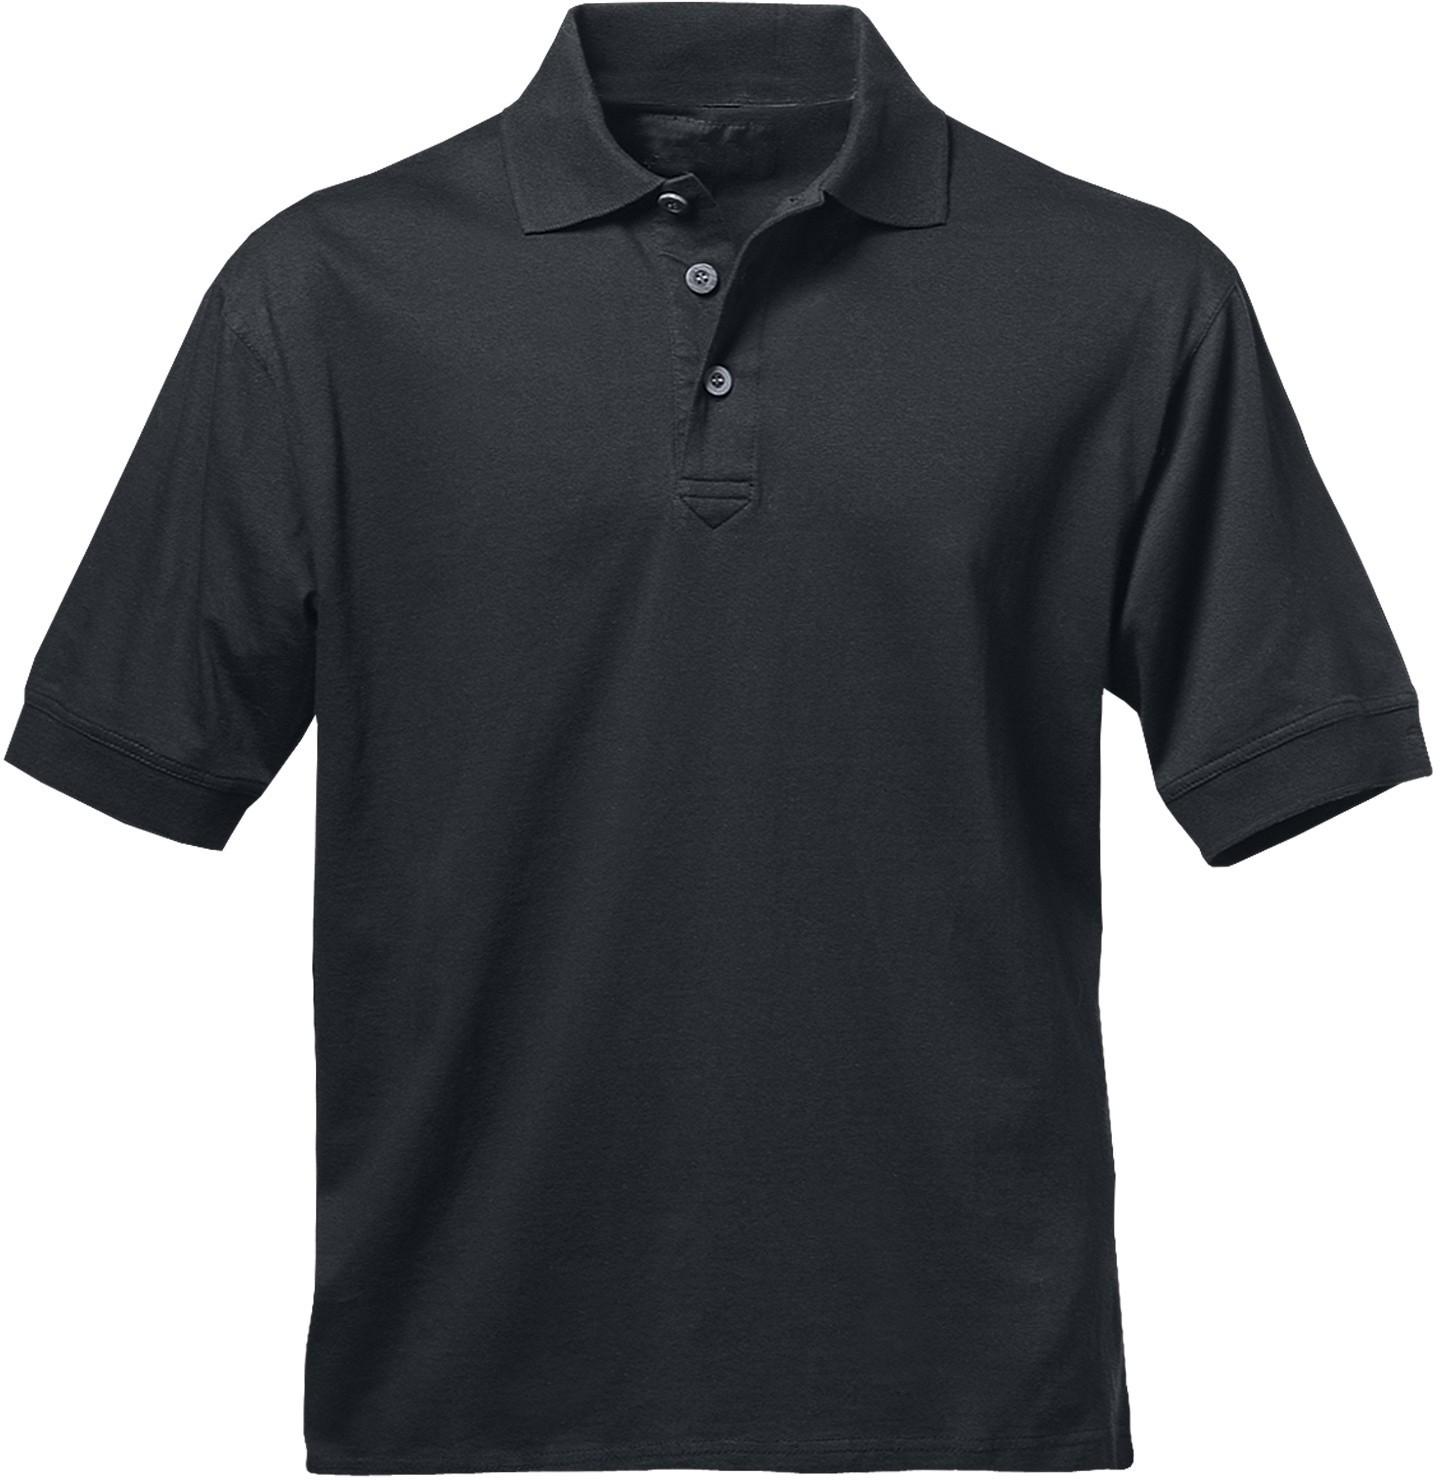 Polo majice for Black polo shirt images